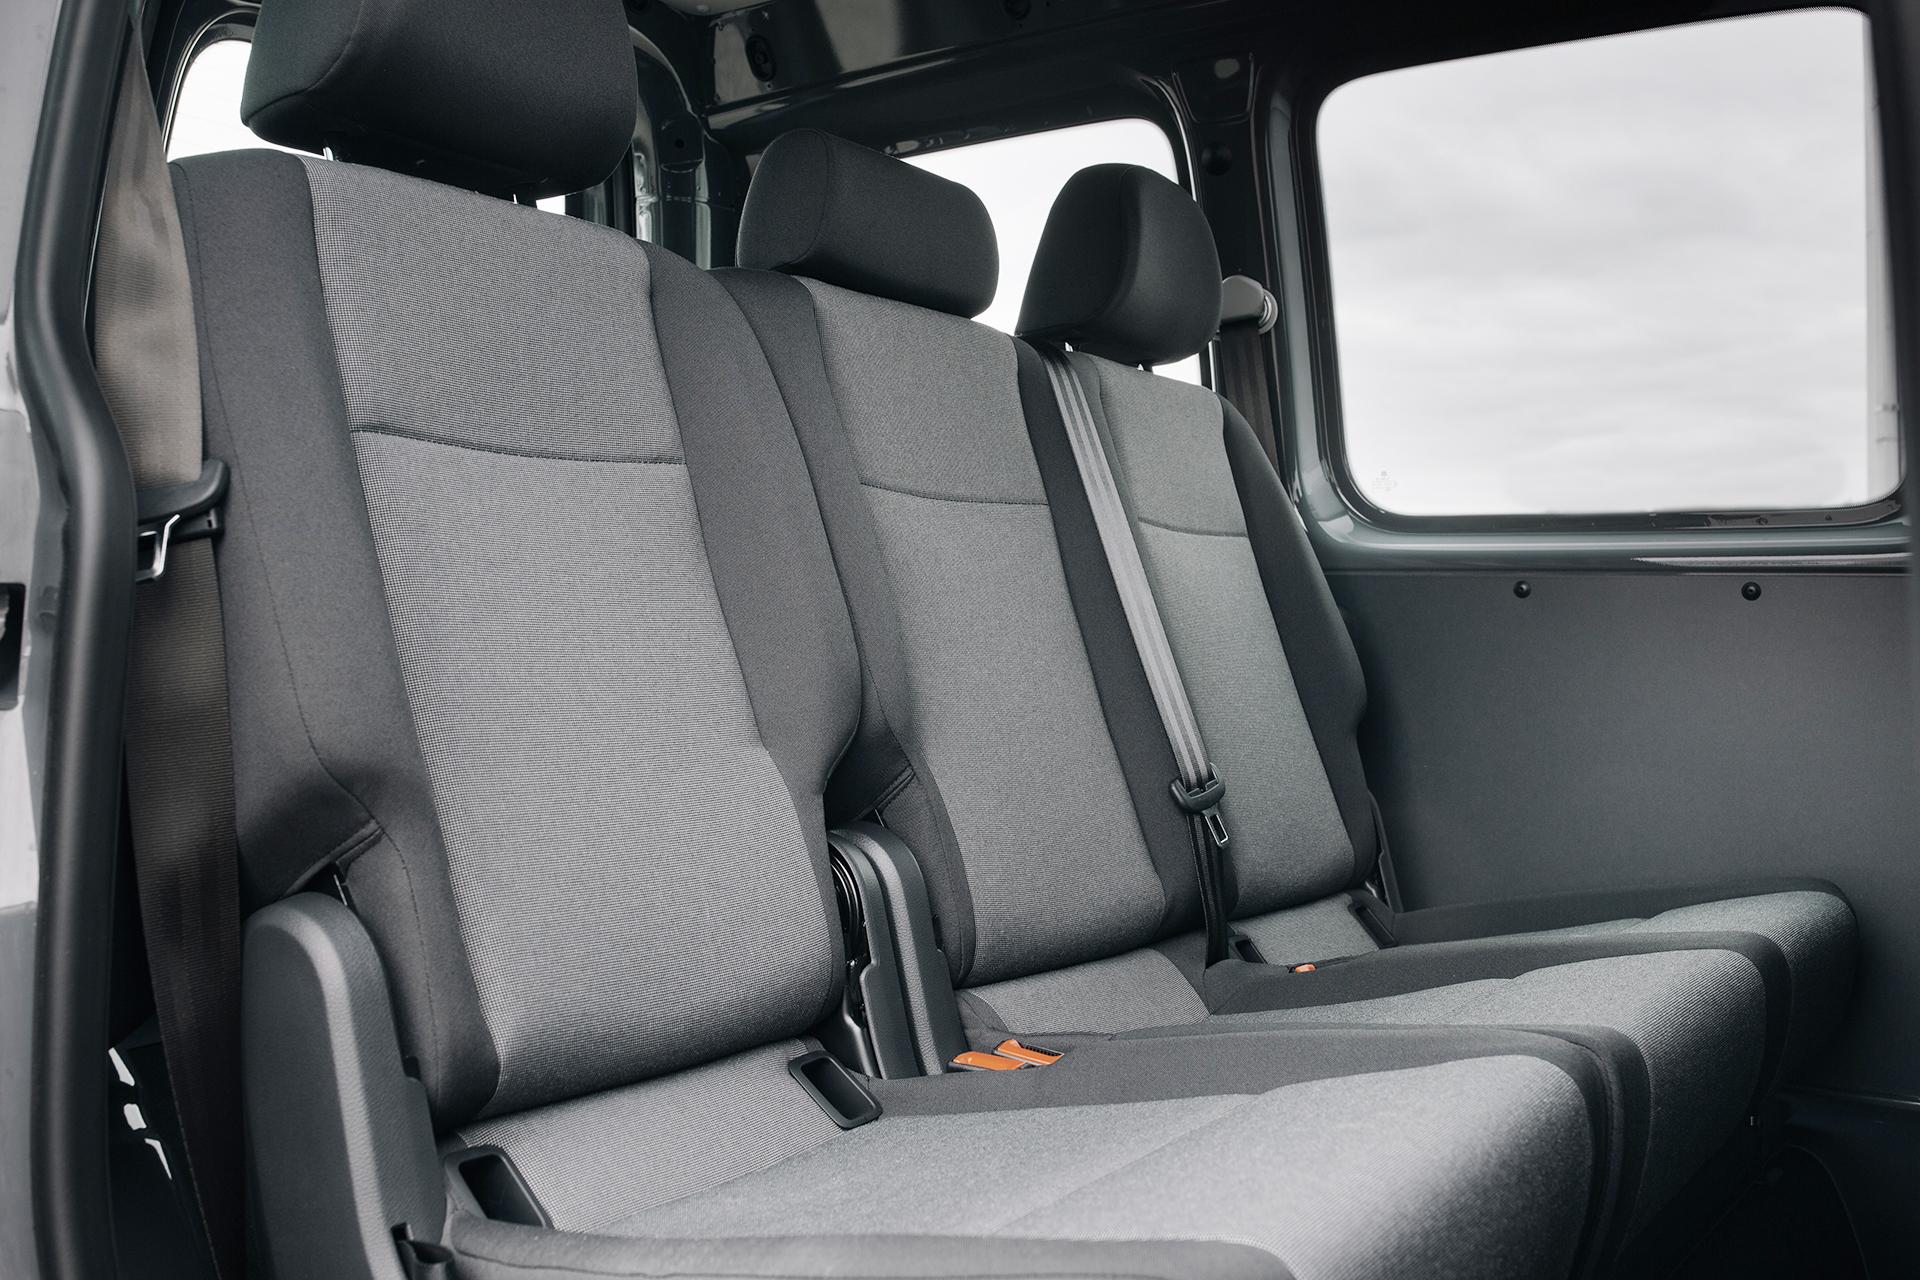 minivan-piscilago-colsubsidio-3 (1)